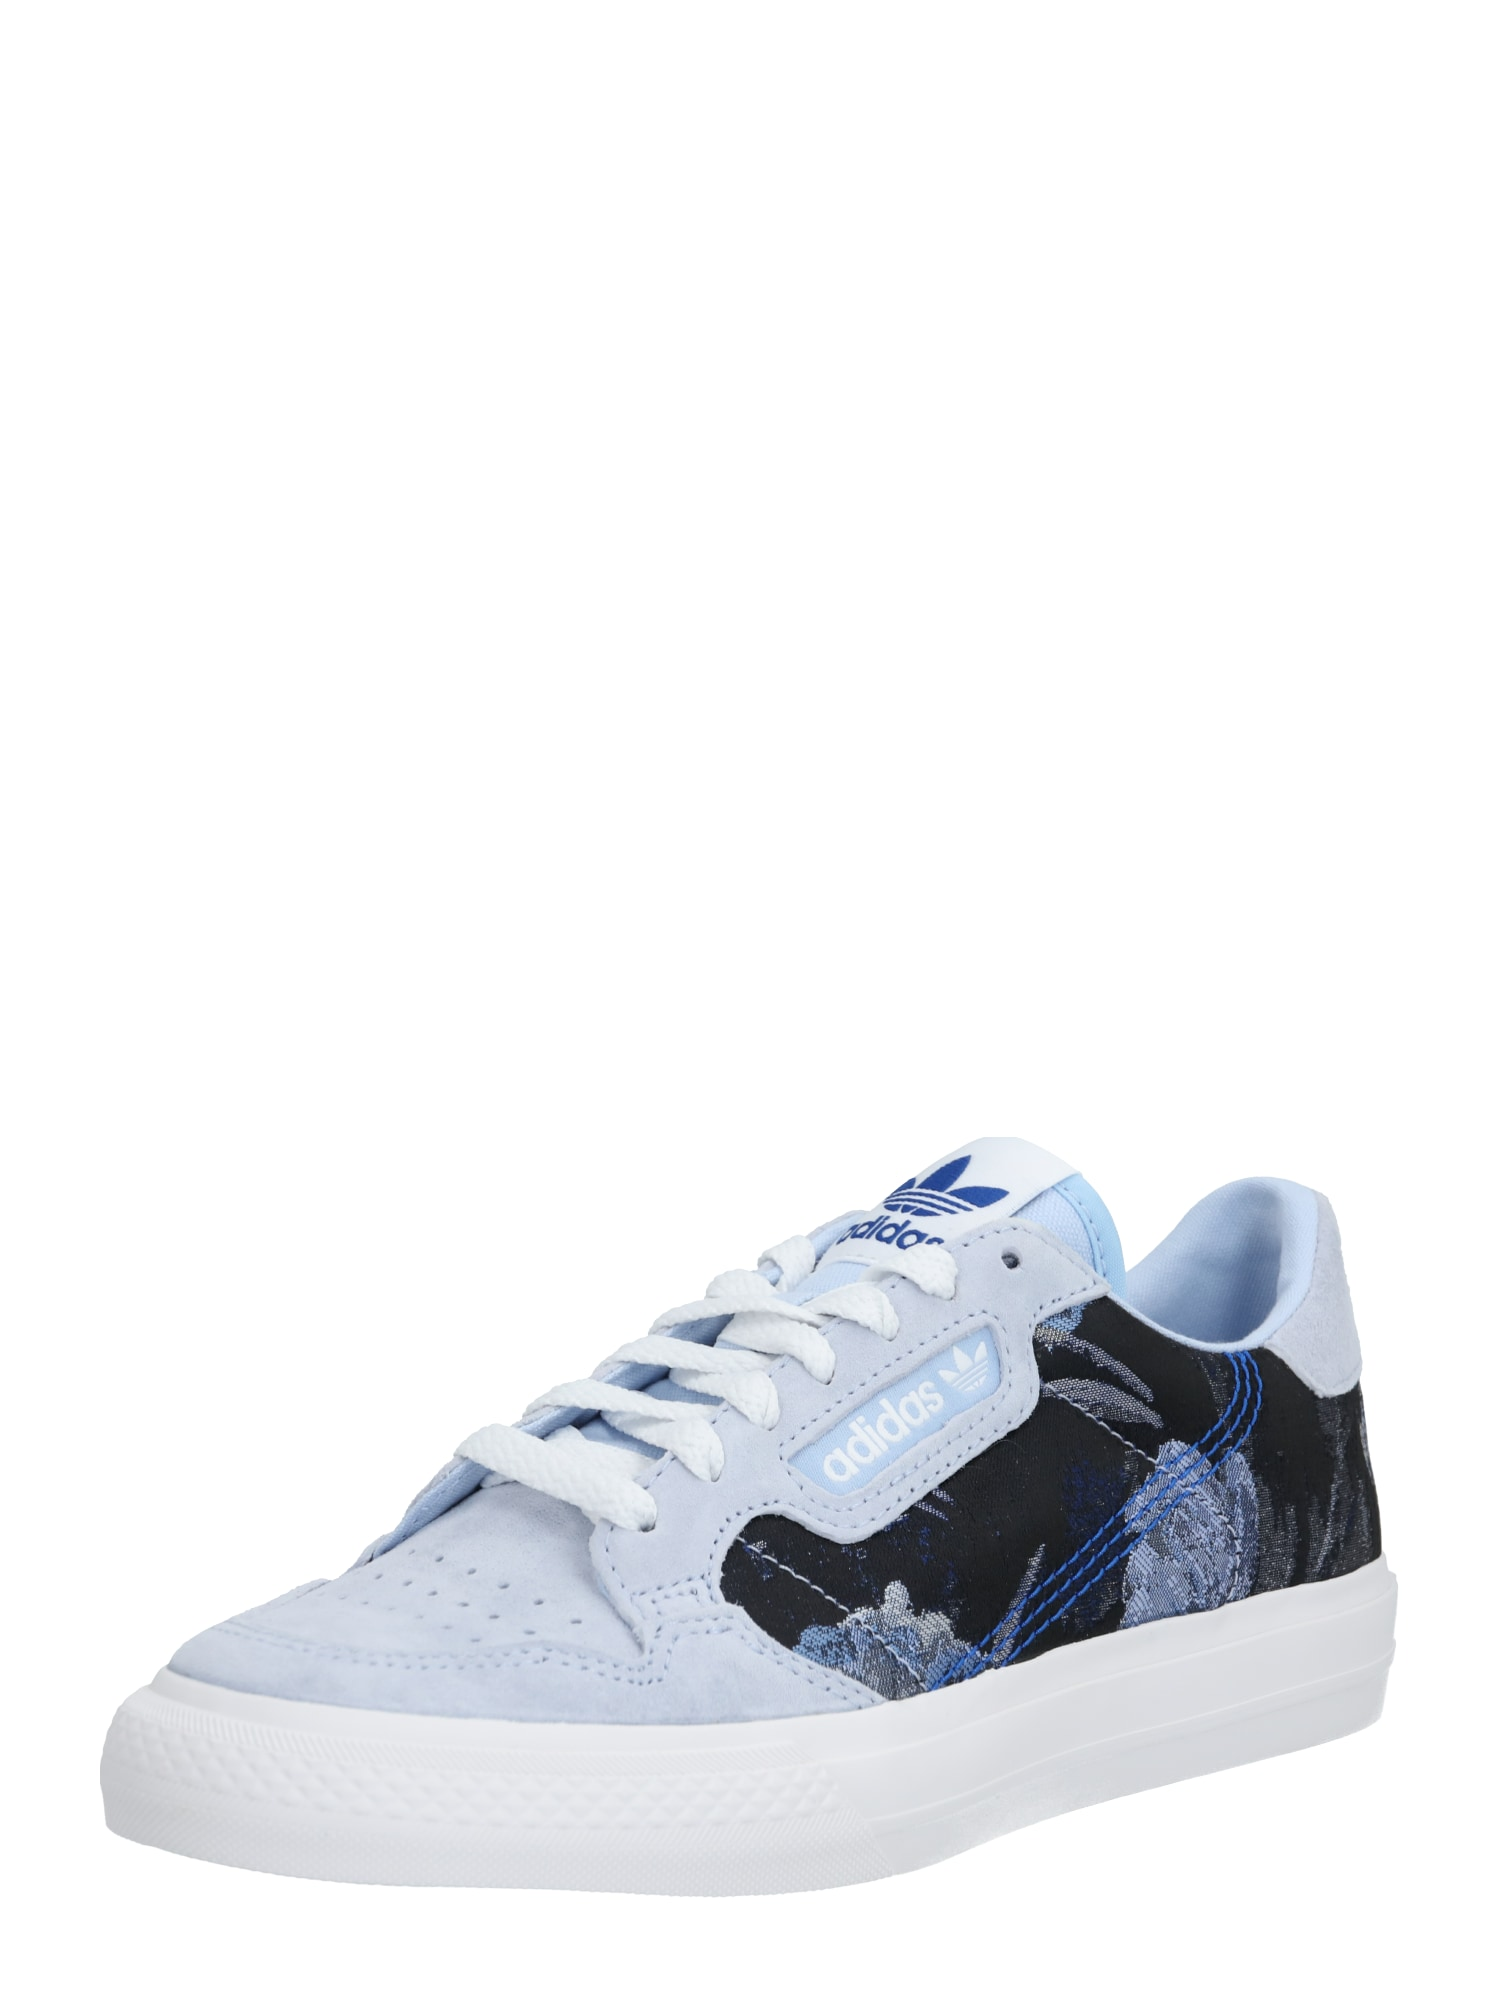 ADIDAS ORIGINALS Nízke tenisky  modré / biela / svetlomodrá